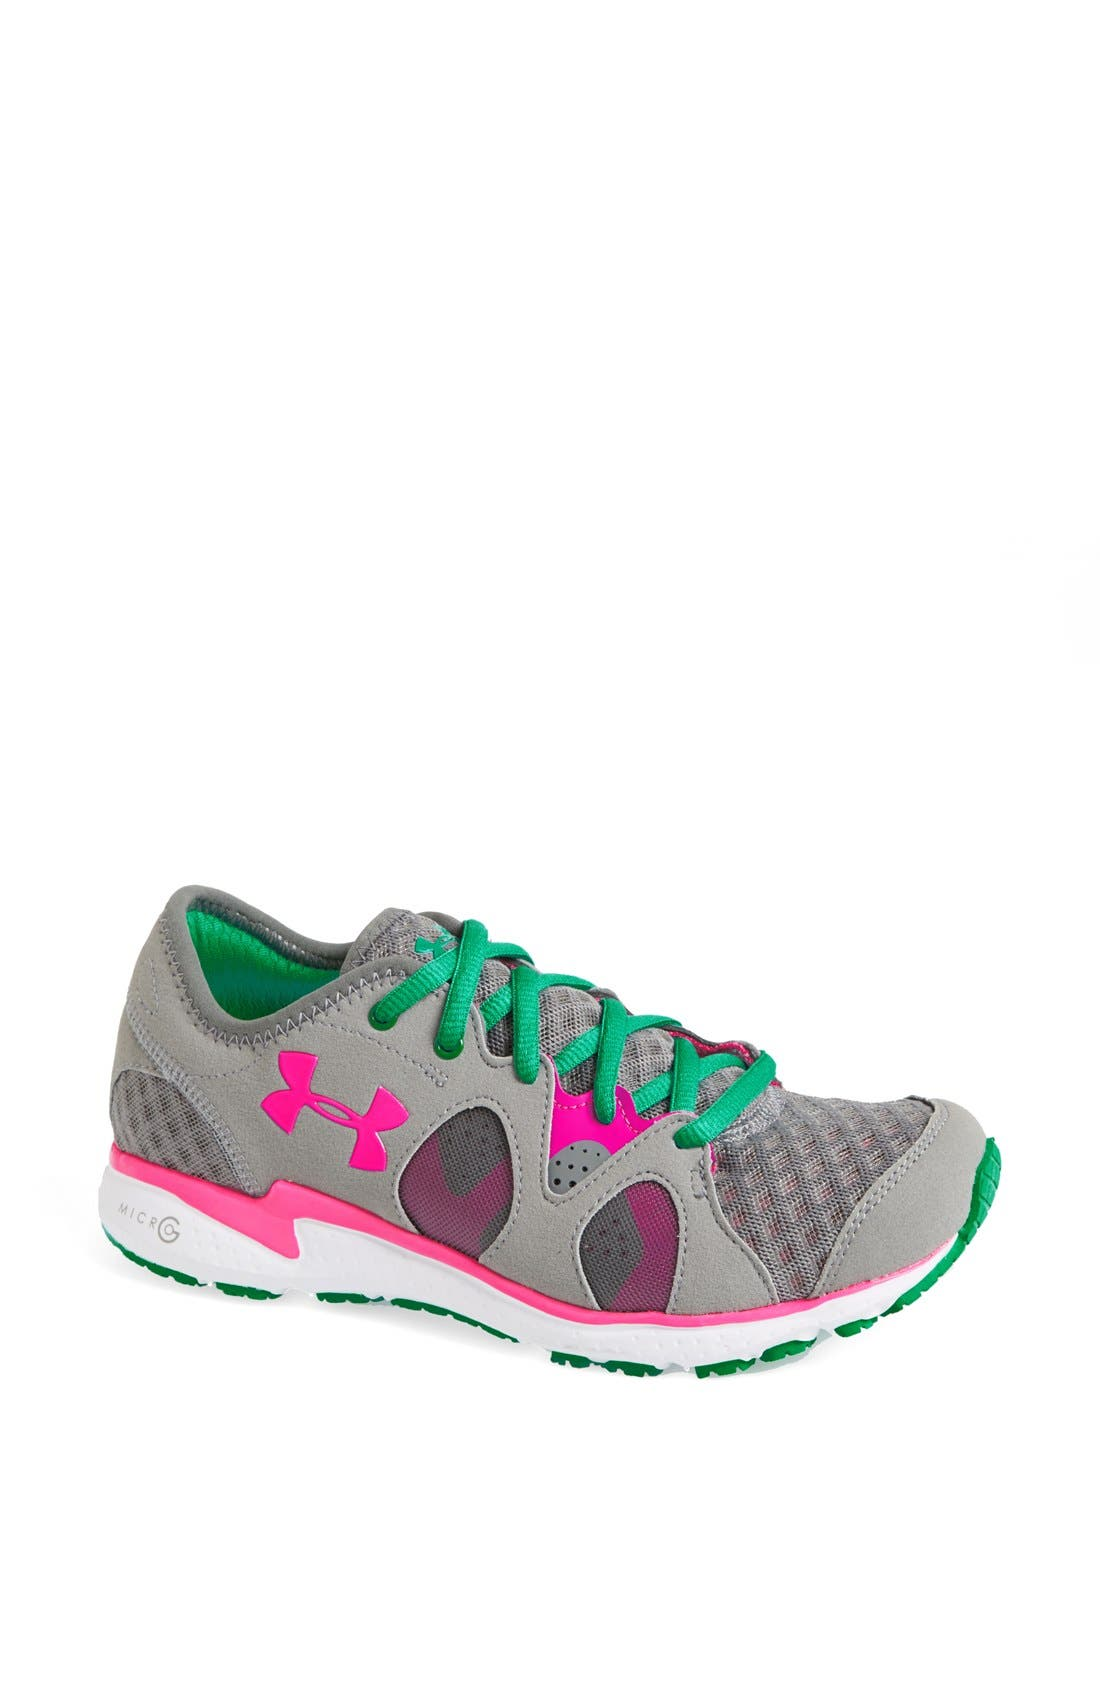 Main Image - Under Armour 'Micro G® Neo Mantis' Running Shoe (Women)